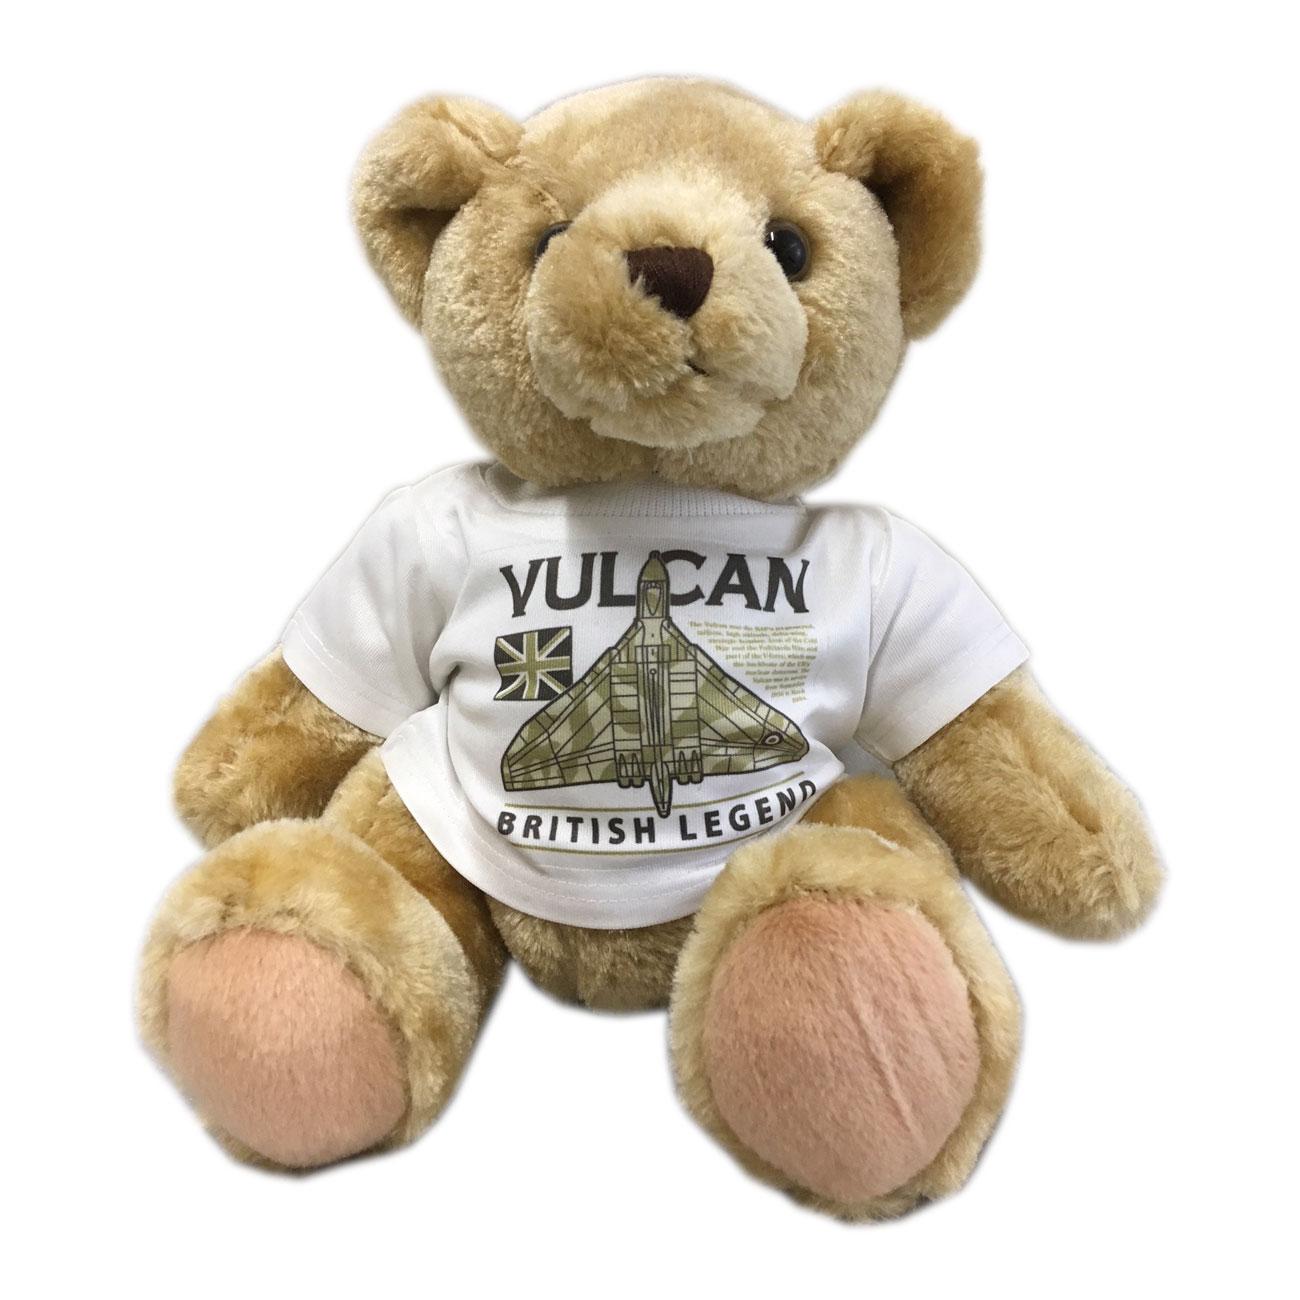 Vulcan Teddy.jpg